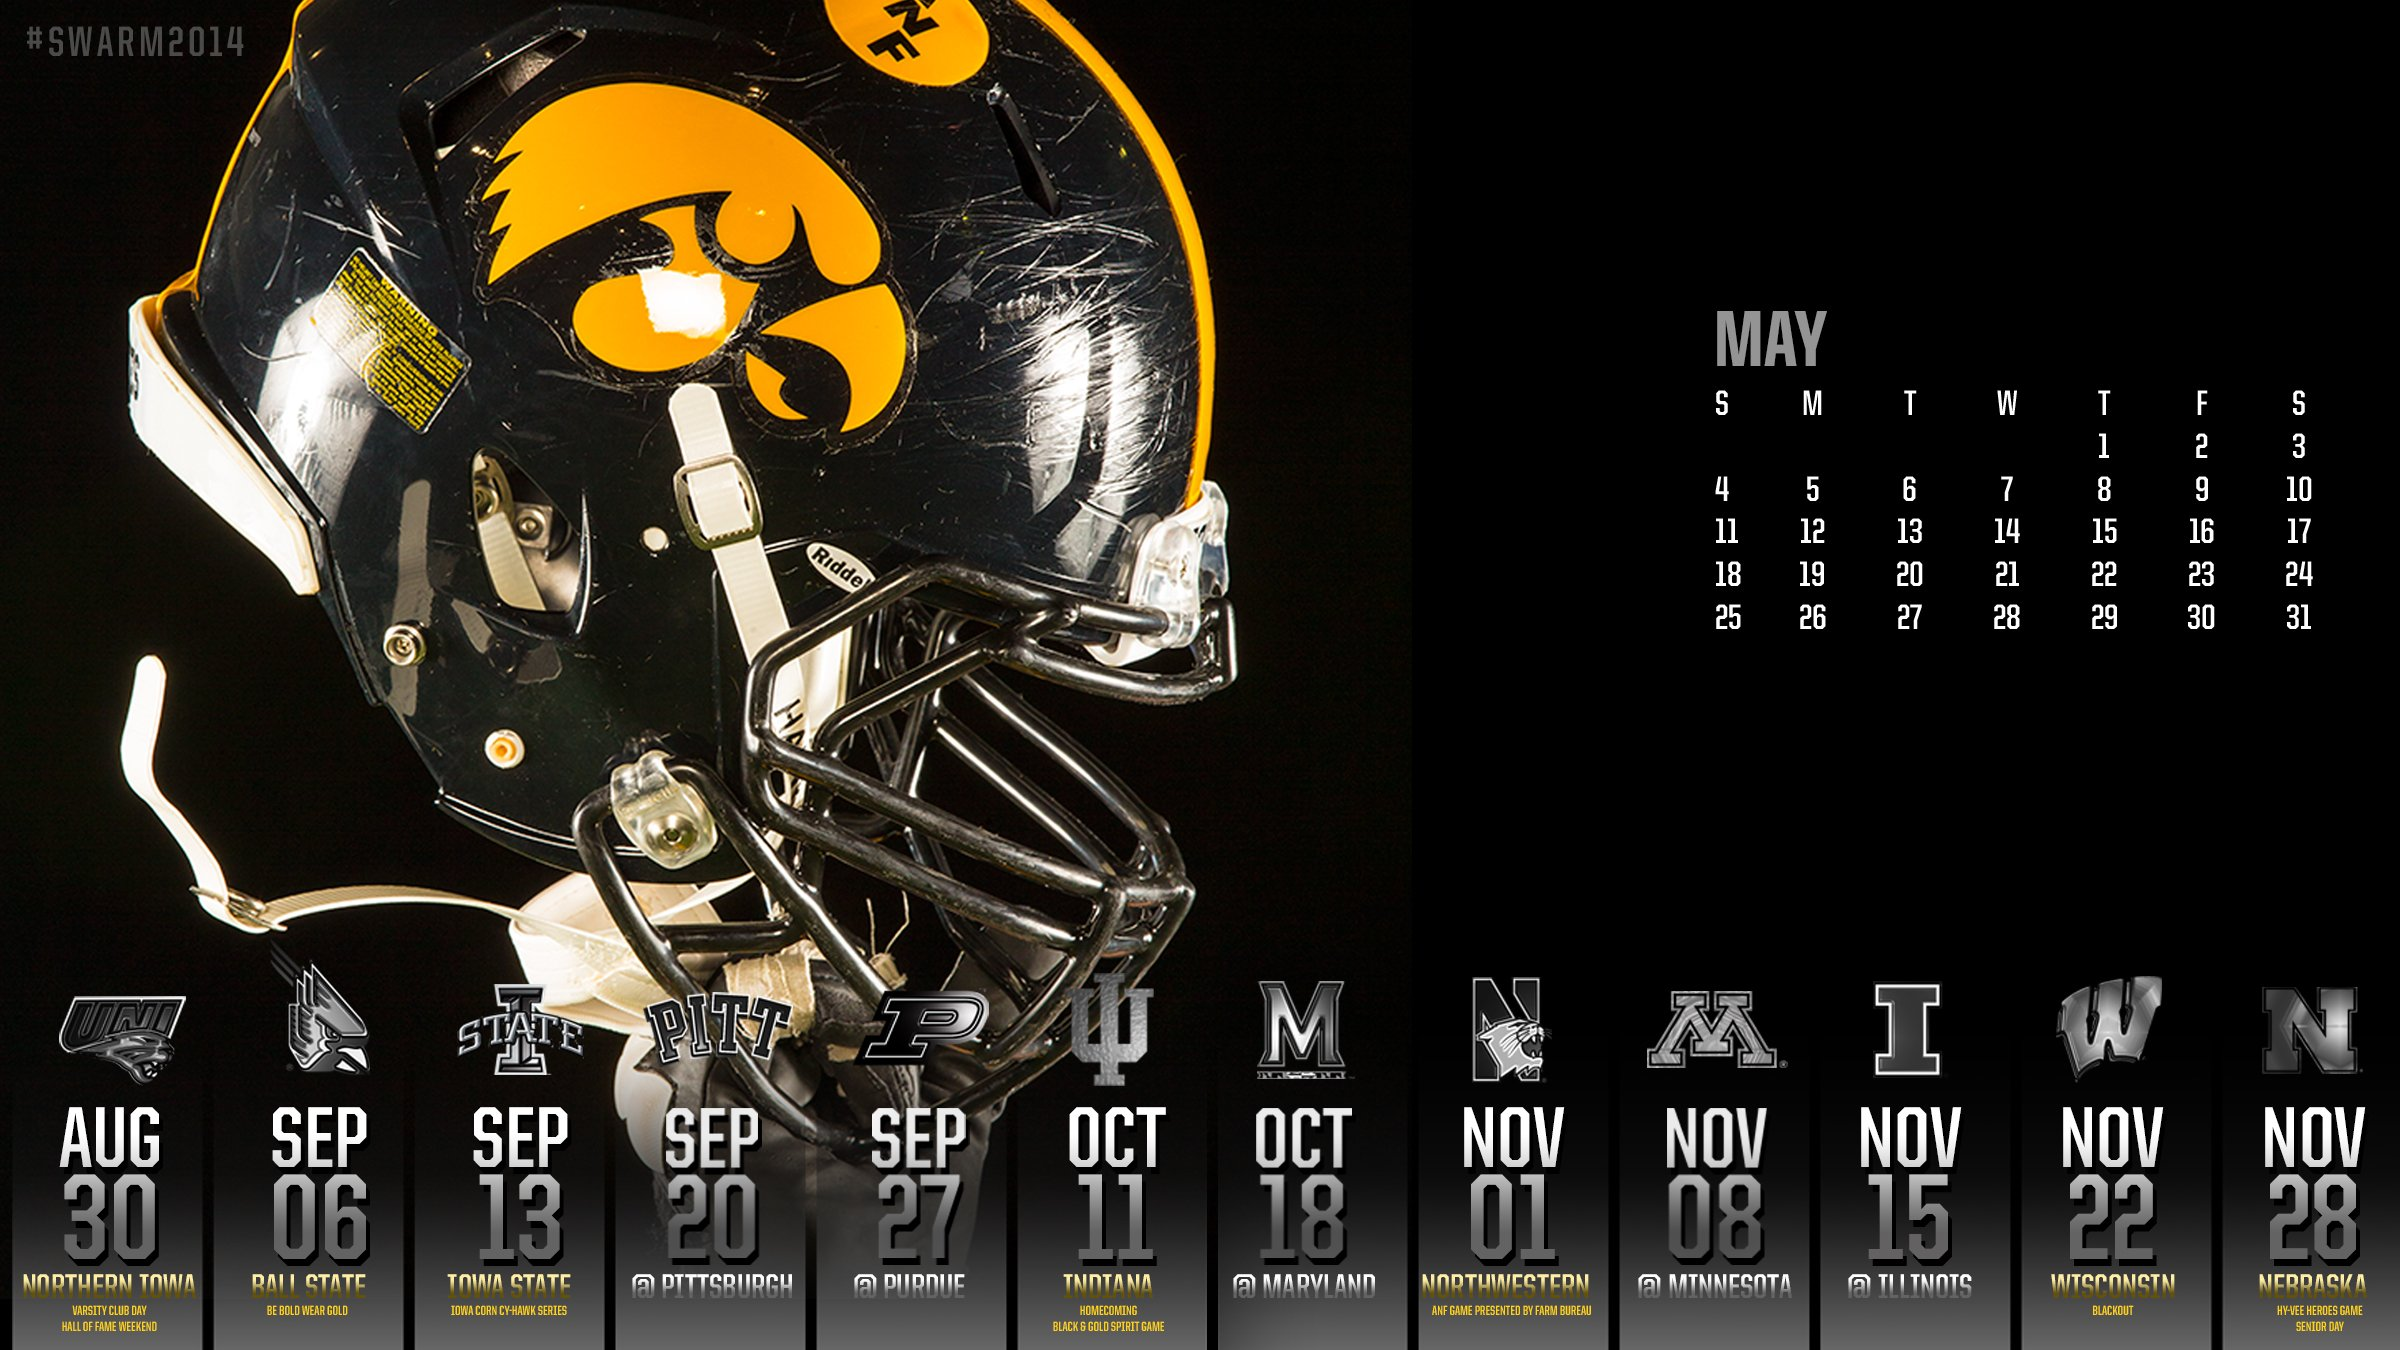 Iowa Hawkeyes College Football Wallpaper 2400x1350